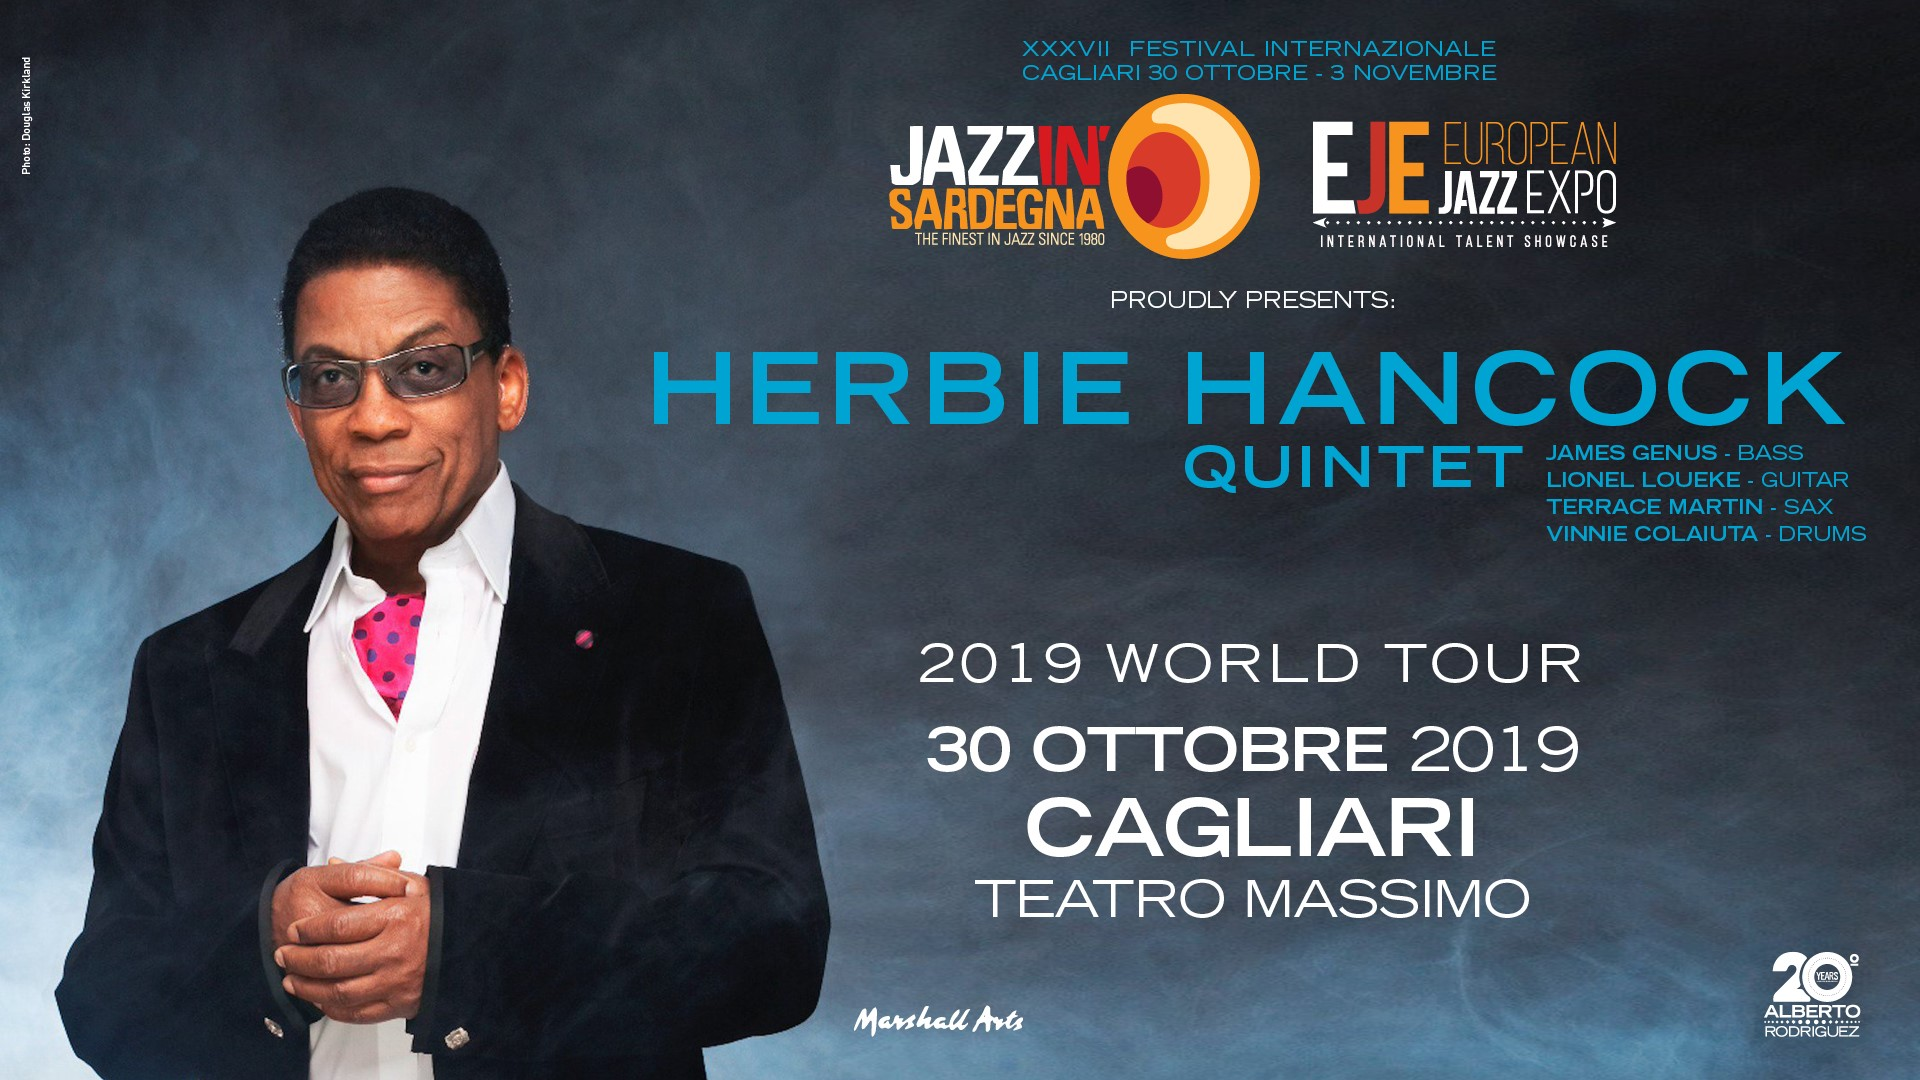 european jazz expo - herbie hancock - festival - jazzinsardegna - sa scena sarda - eventi